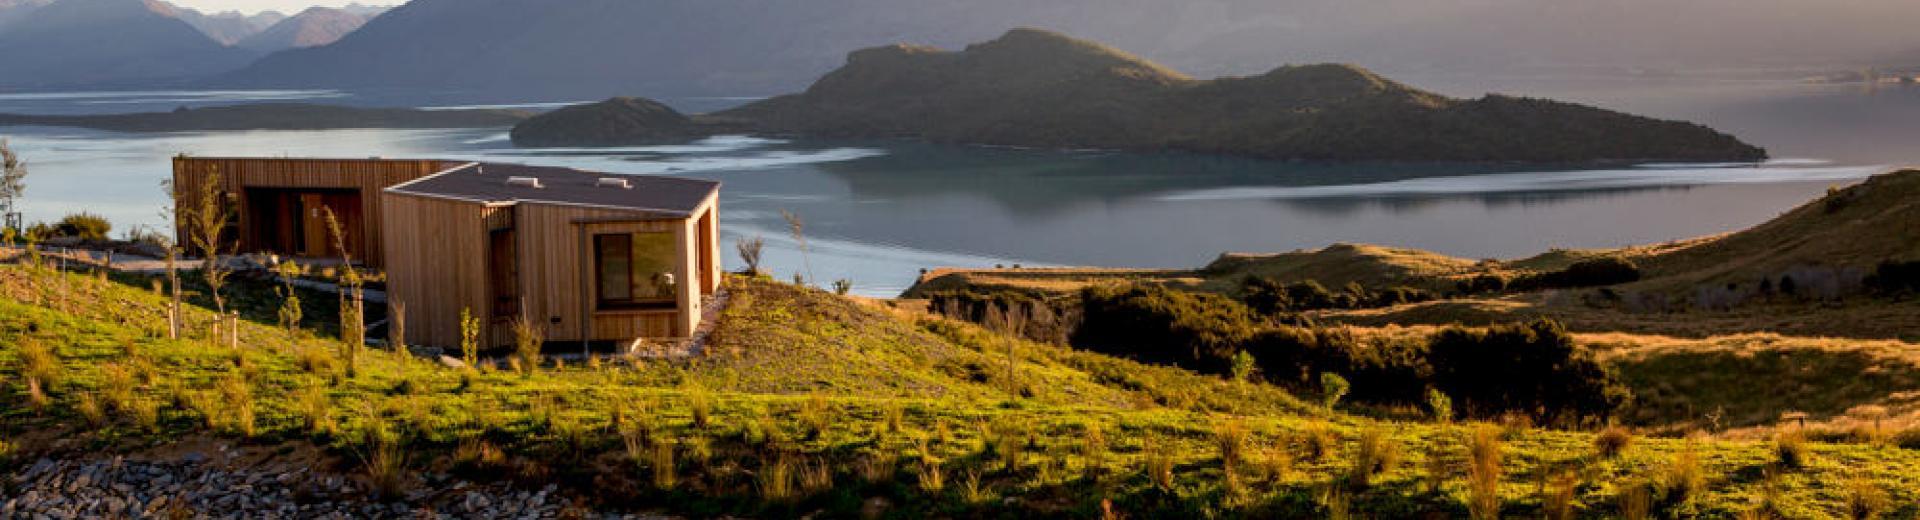 Luxury Cabin by the water - Queenstown New Zealand